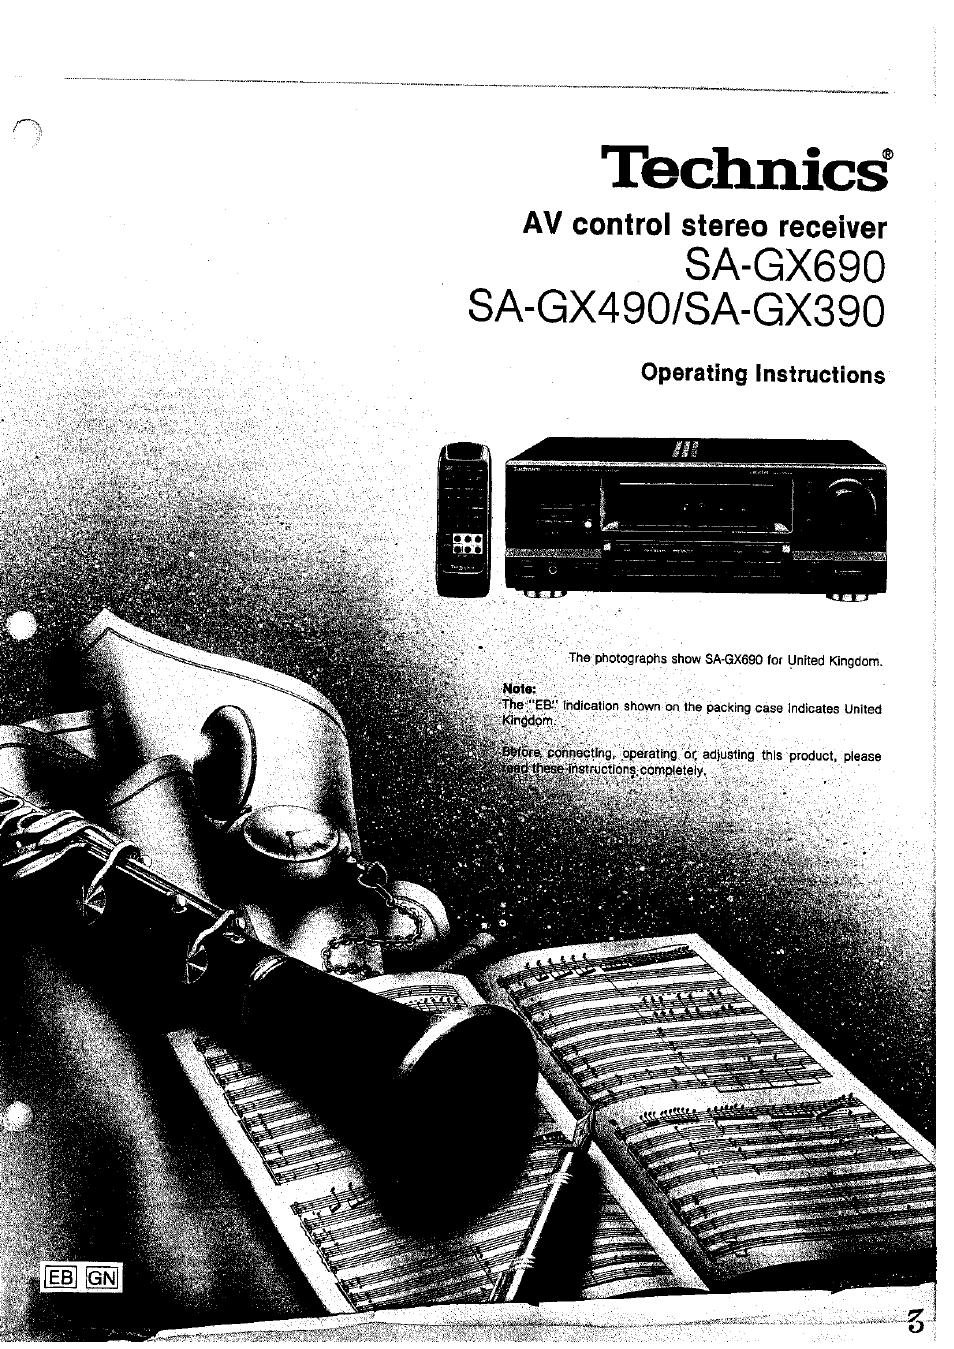 Panasonic stereo receiver sagx690 user guide | manualsonline.